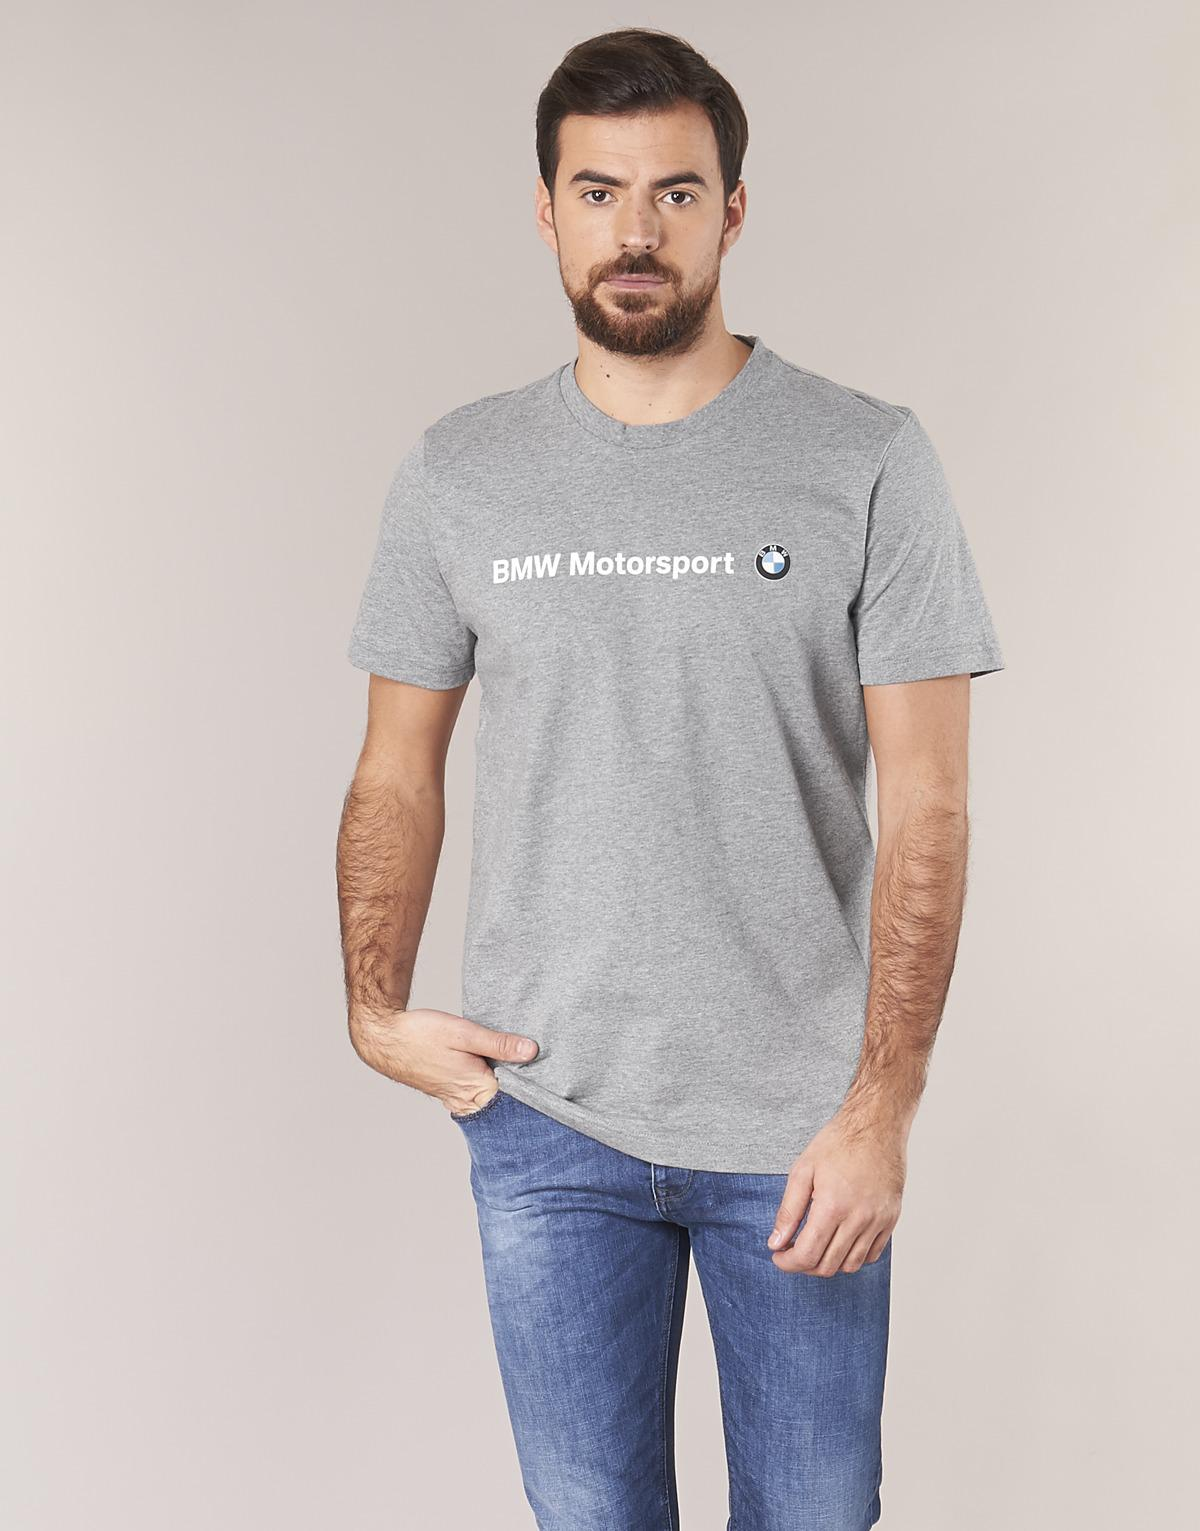 1b29eb27093 PUMA Bmw Msp Logo Tee Men's T Shirt In Grey in Gray for Men - Lyst